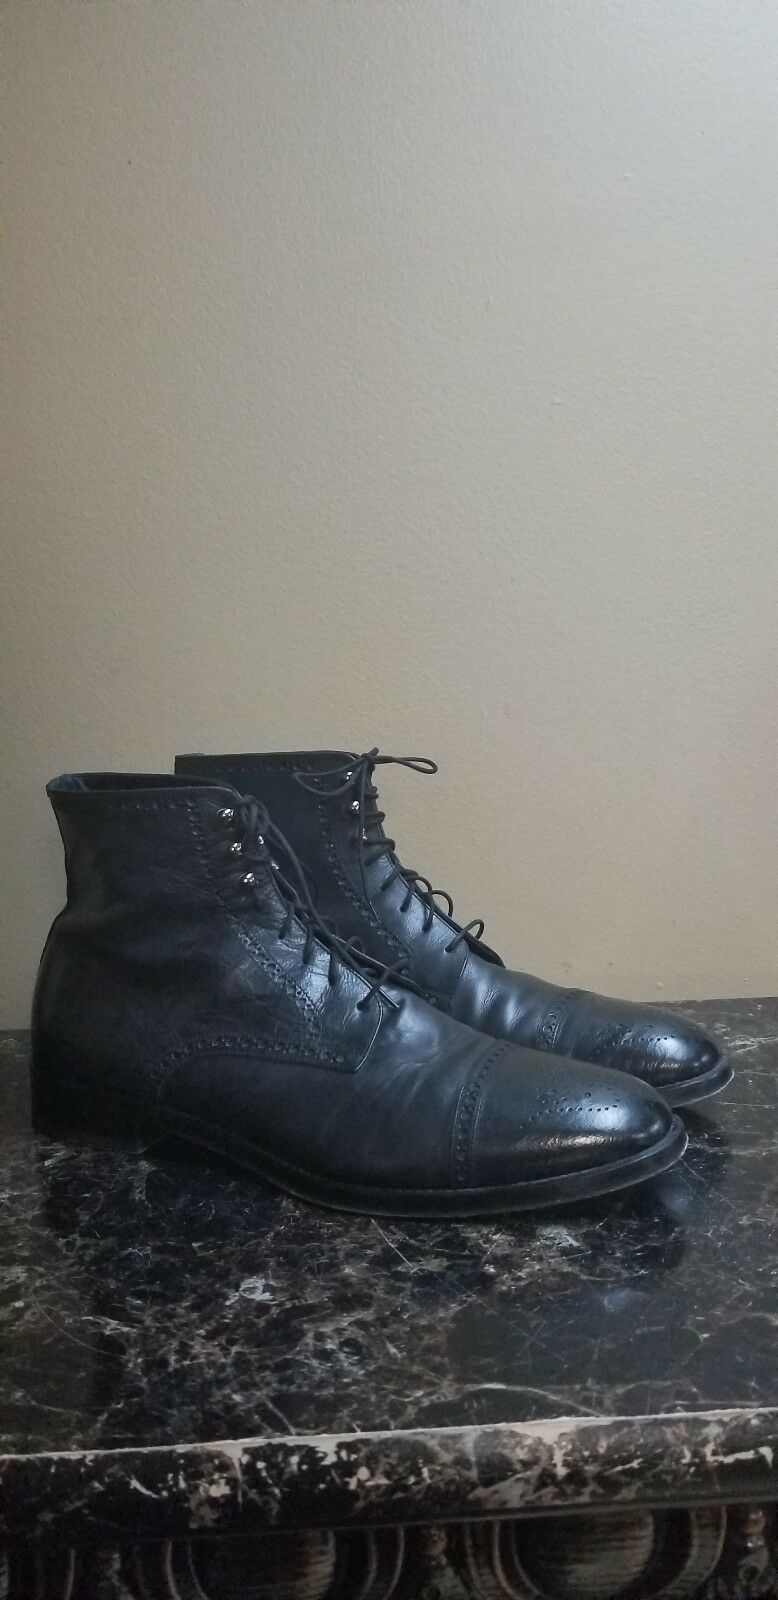 Antonio Maurizi Con Cordones Cuero Negro Puntera botas 45 US 12 Militar Jumper